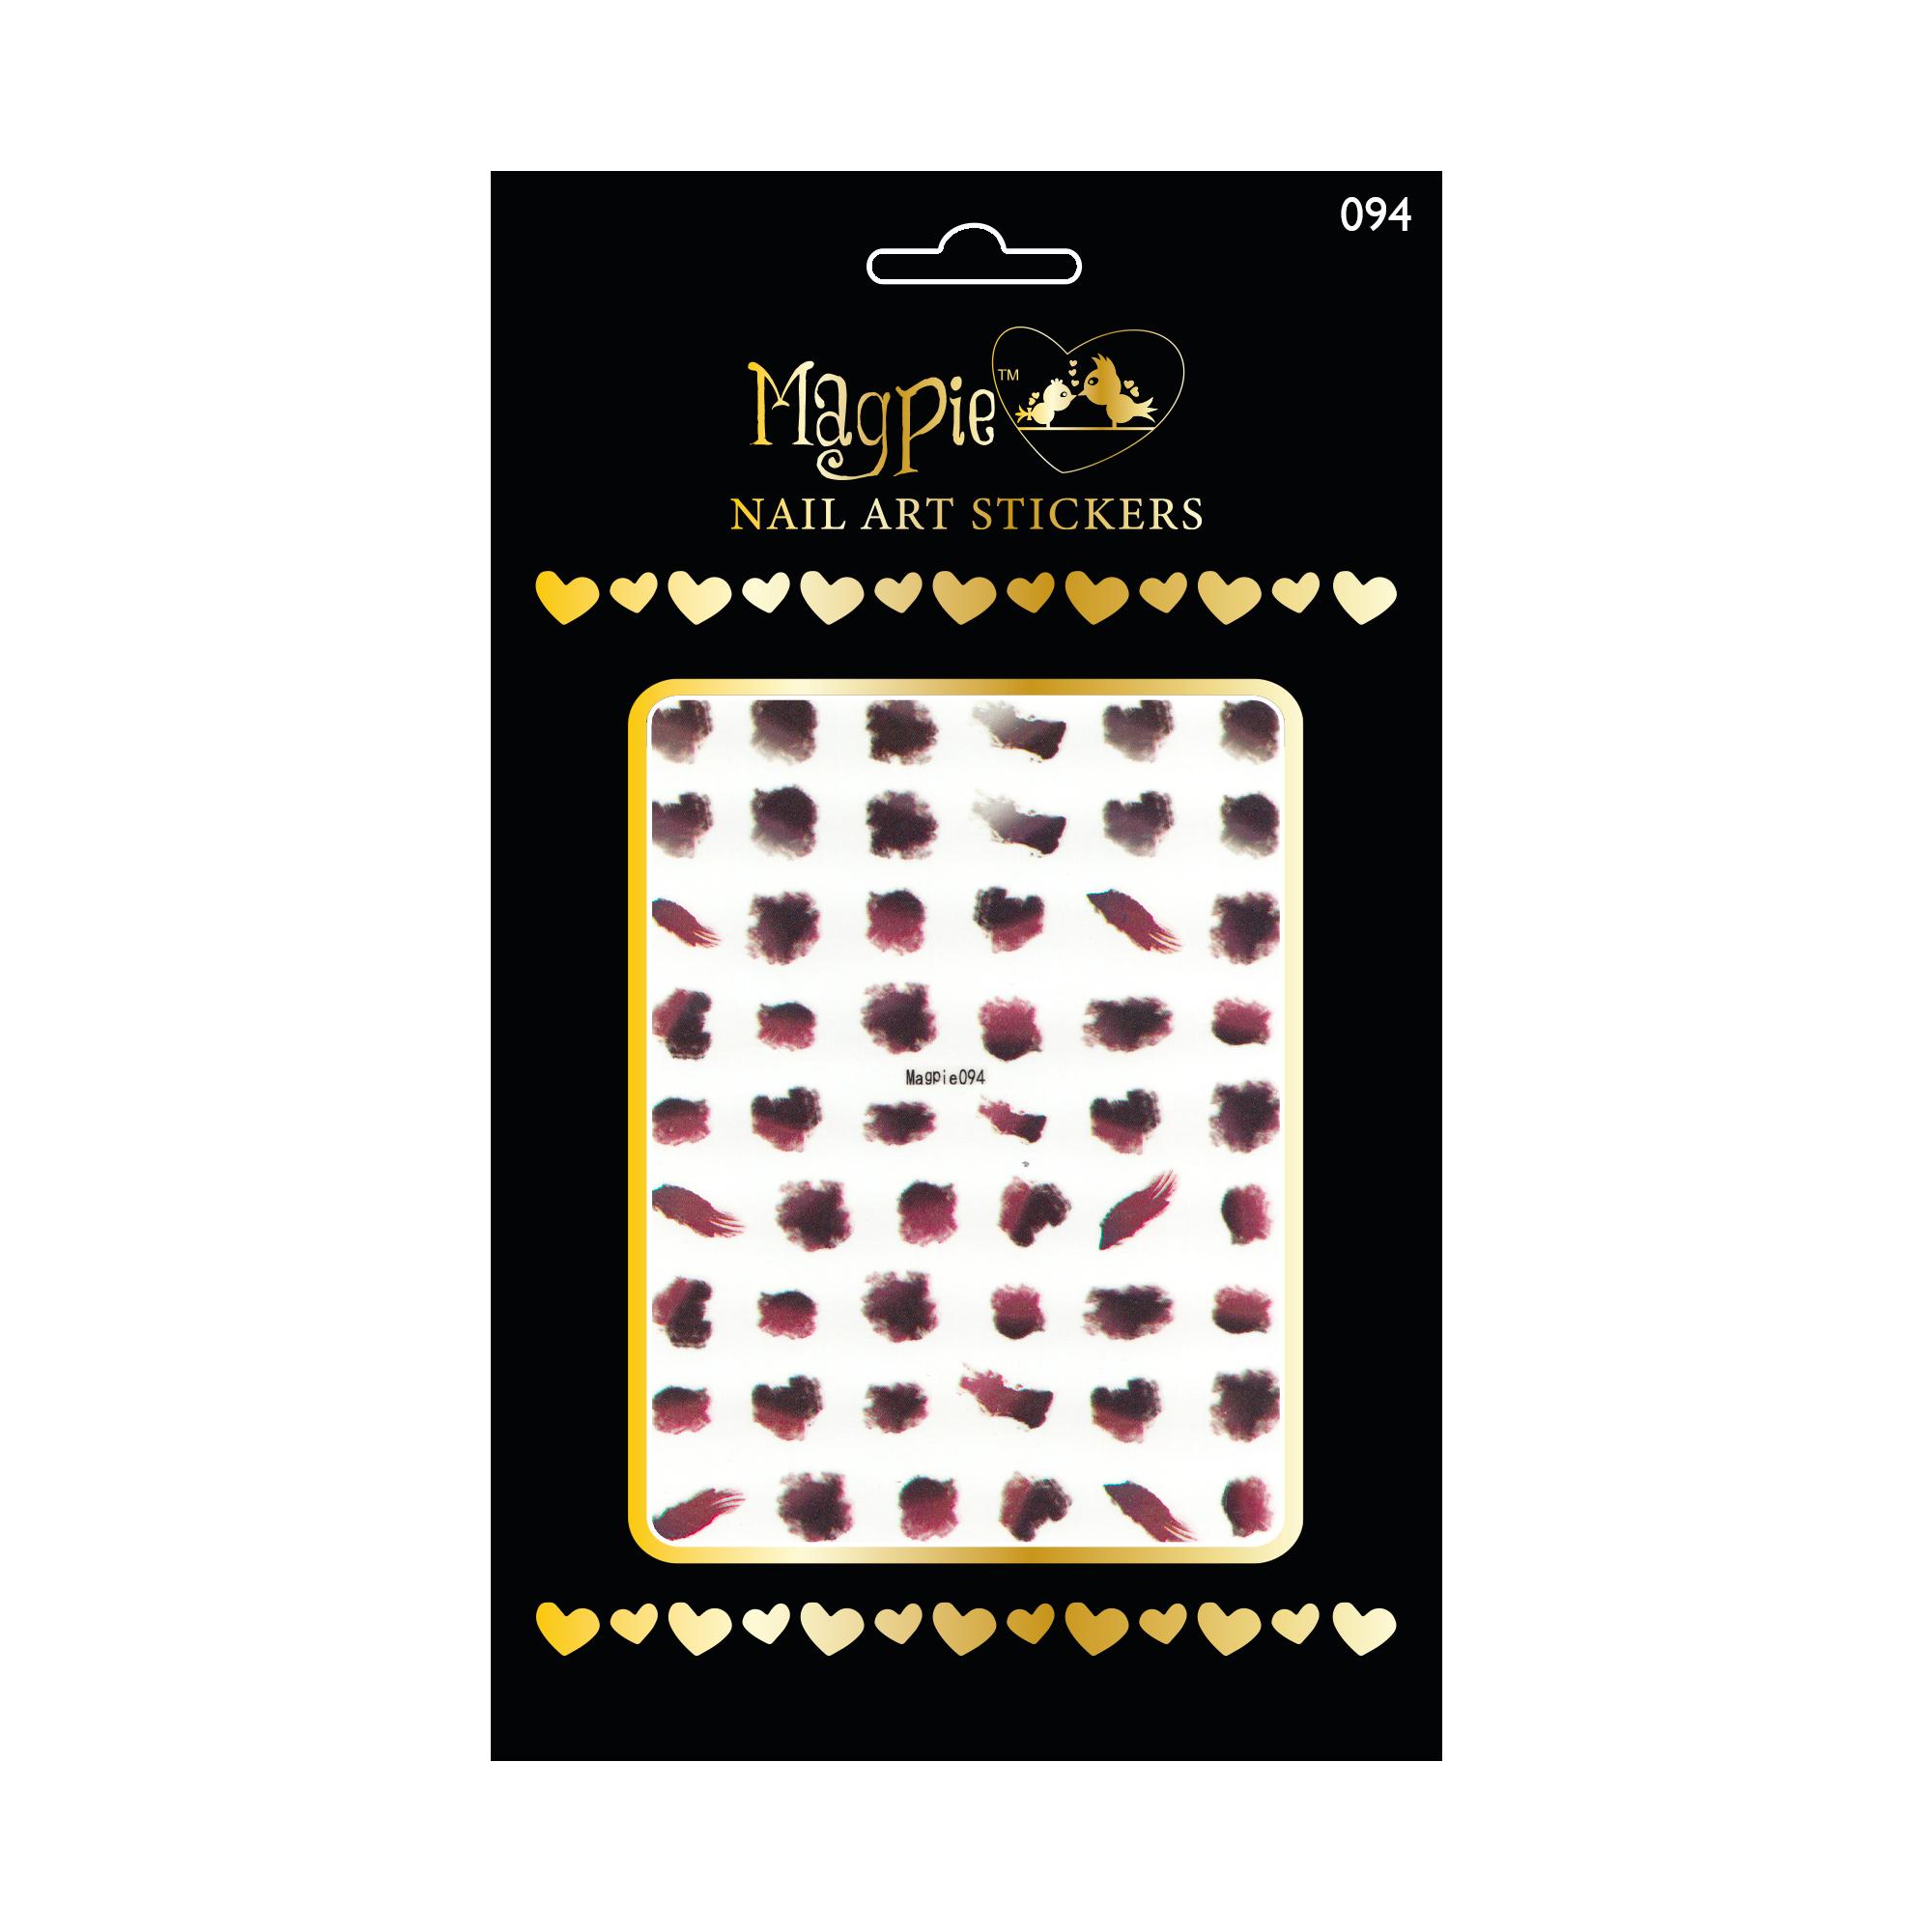 Magpie 094 stickers